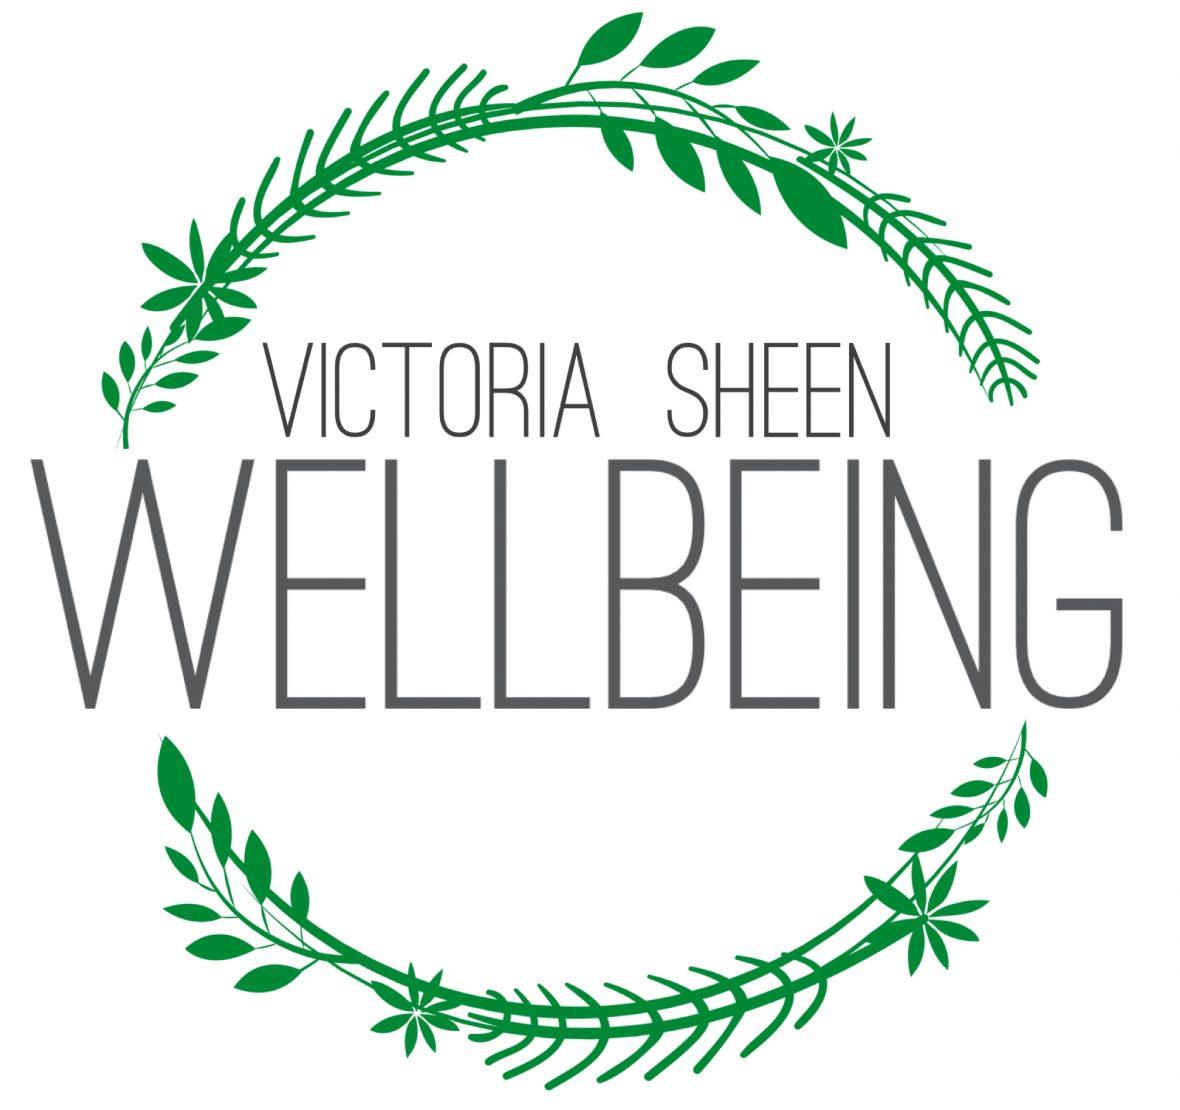 Victoria Sheen Wellbeing